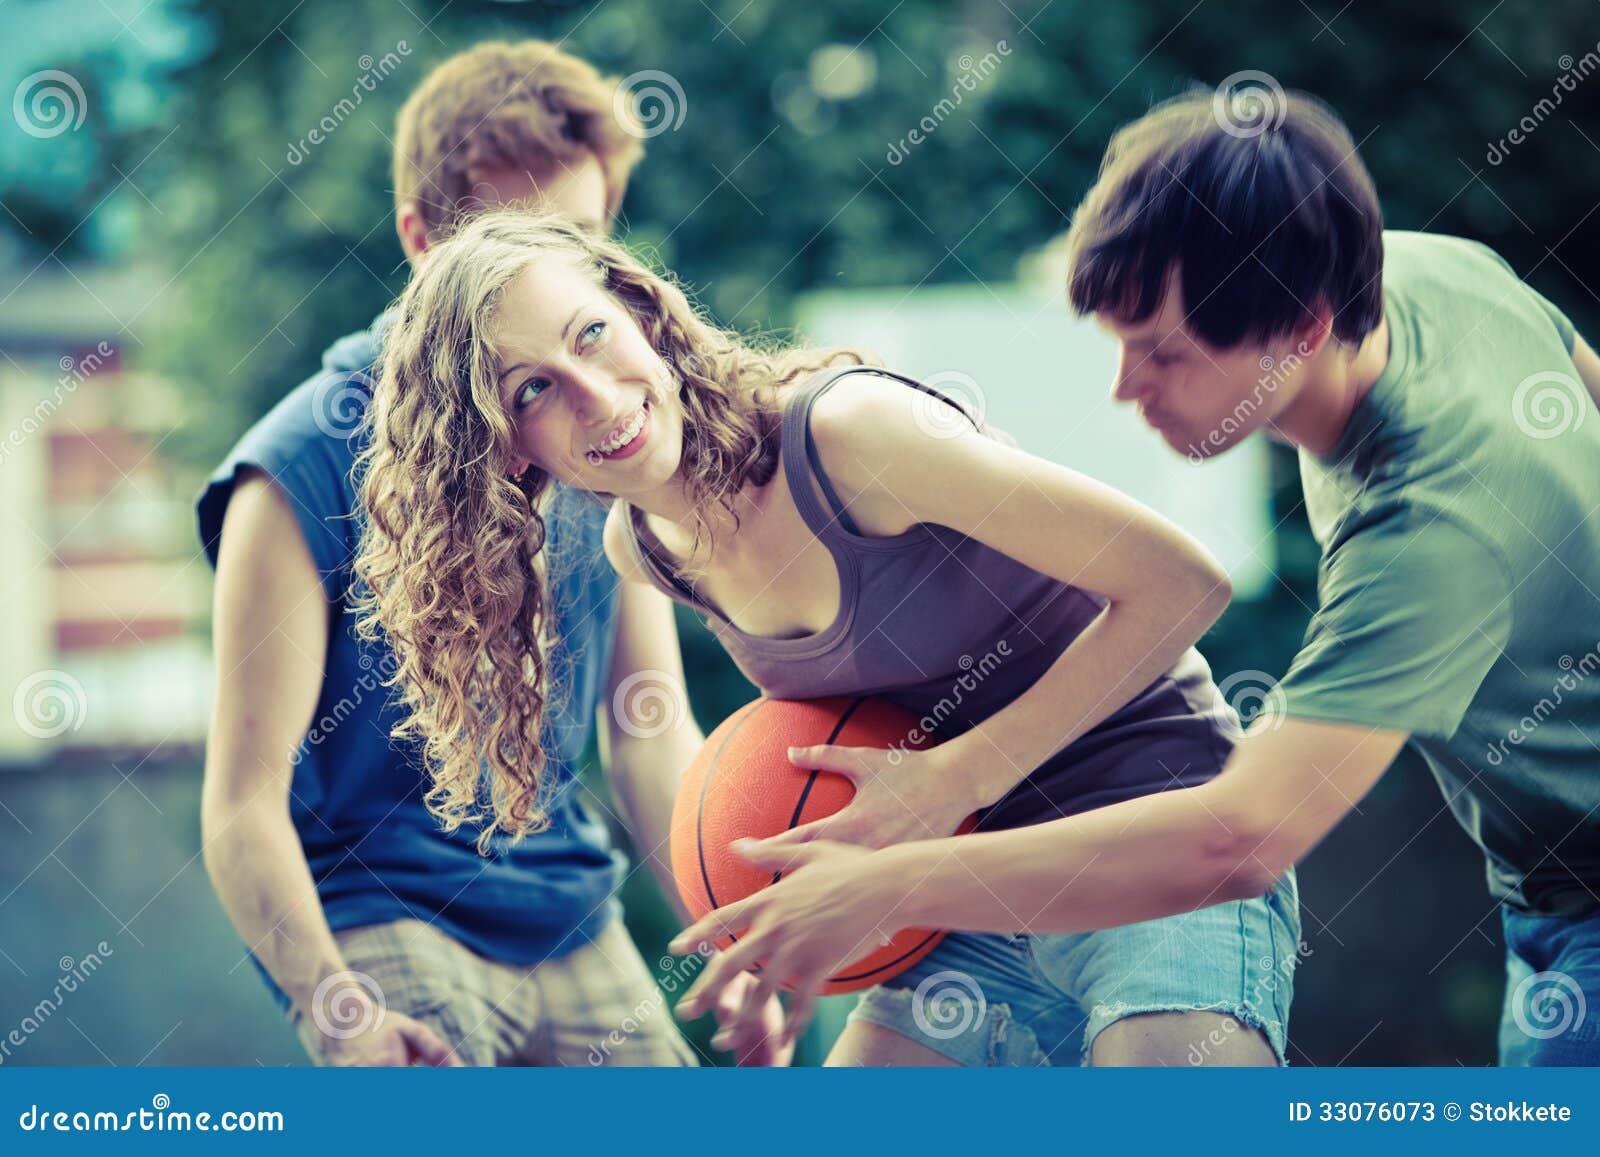 2 players games girl and boys